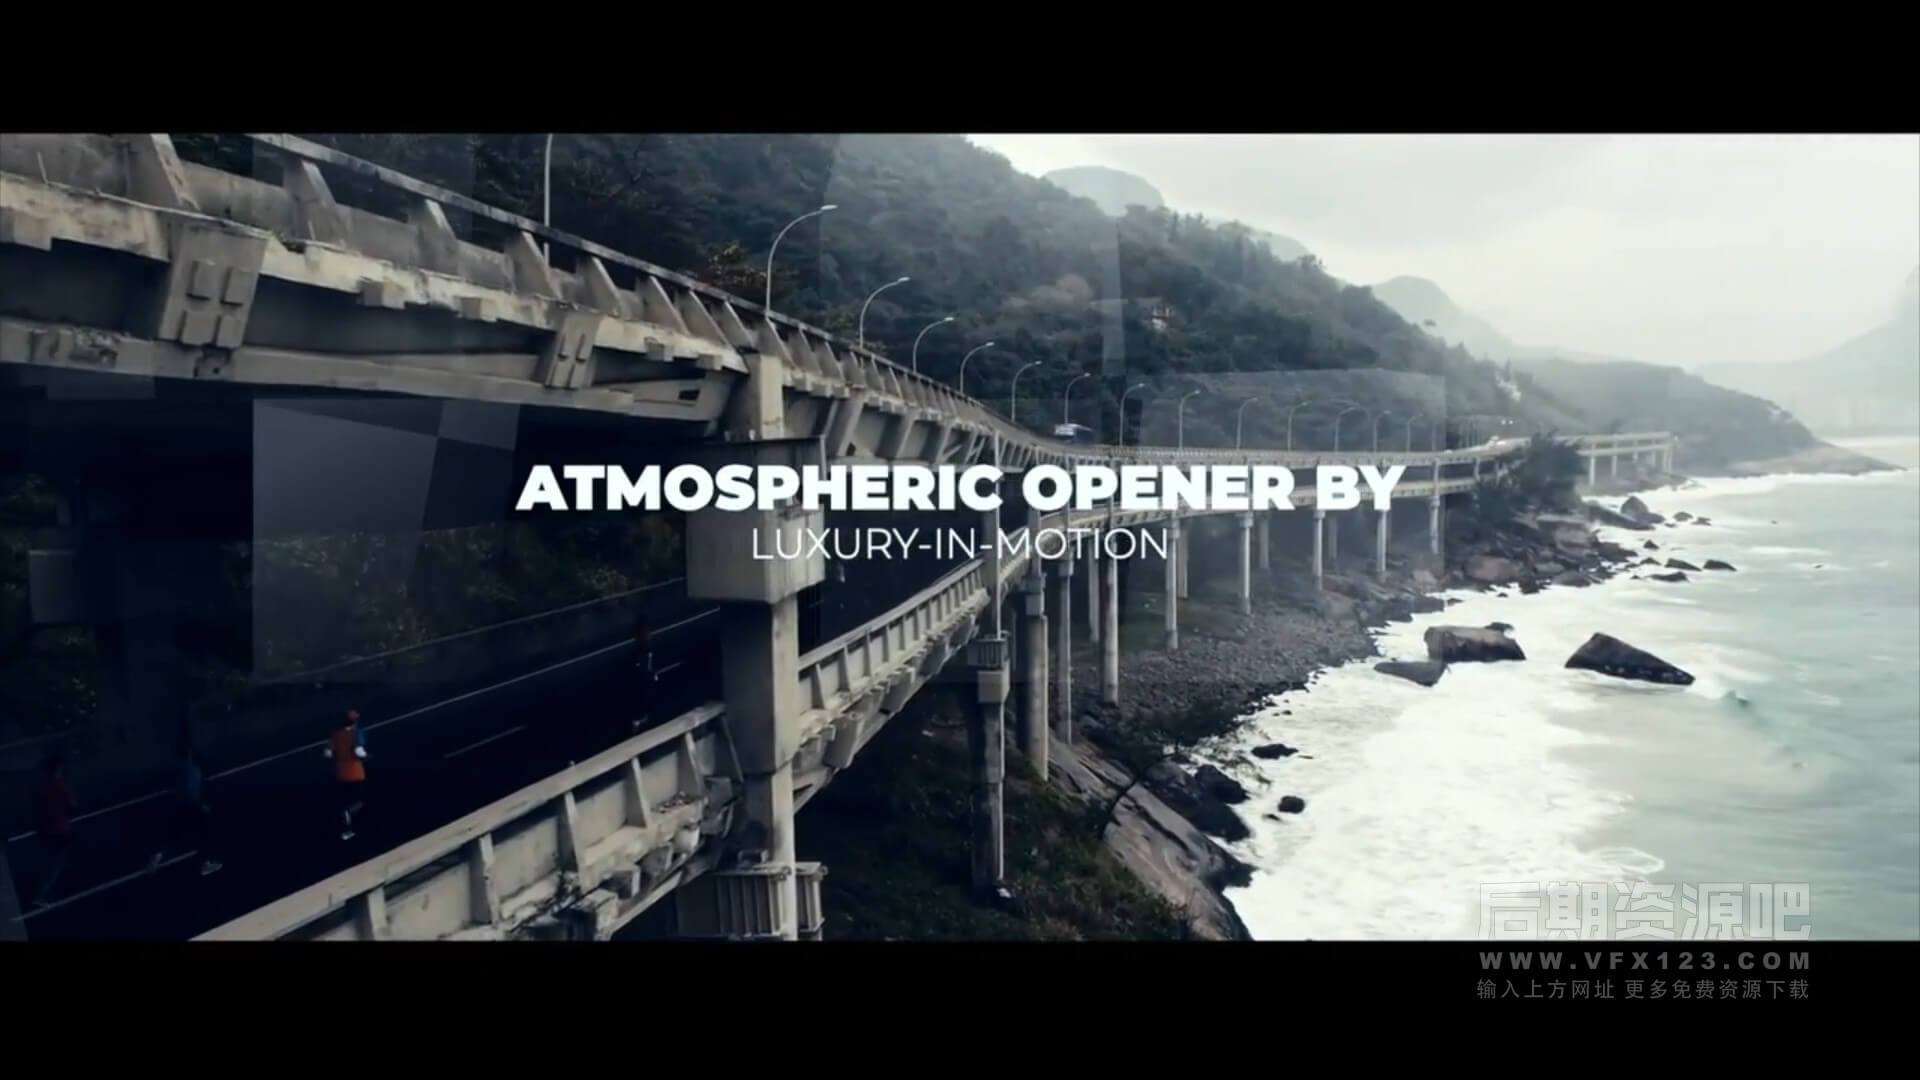 fcpx主题模板 大气梦幻棱镜光晕漏光效果图文展示片头 Atmospheric Opener